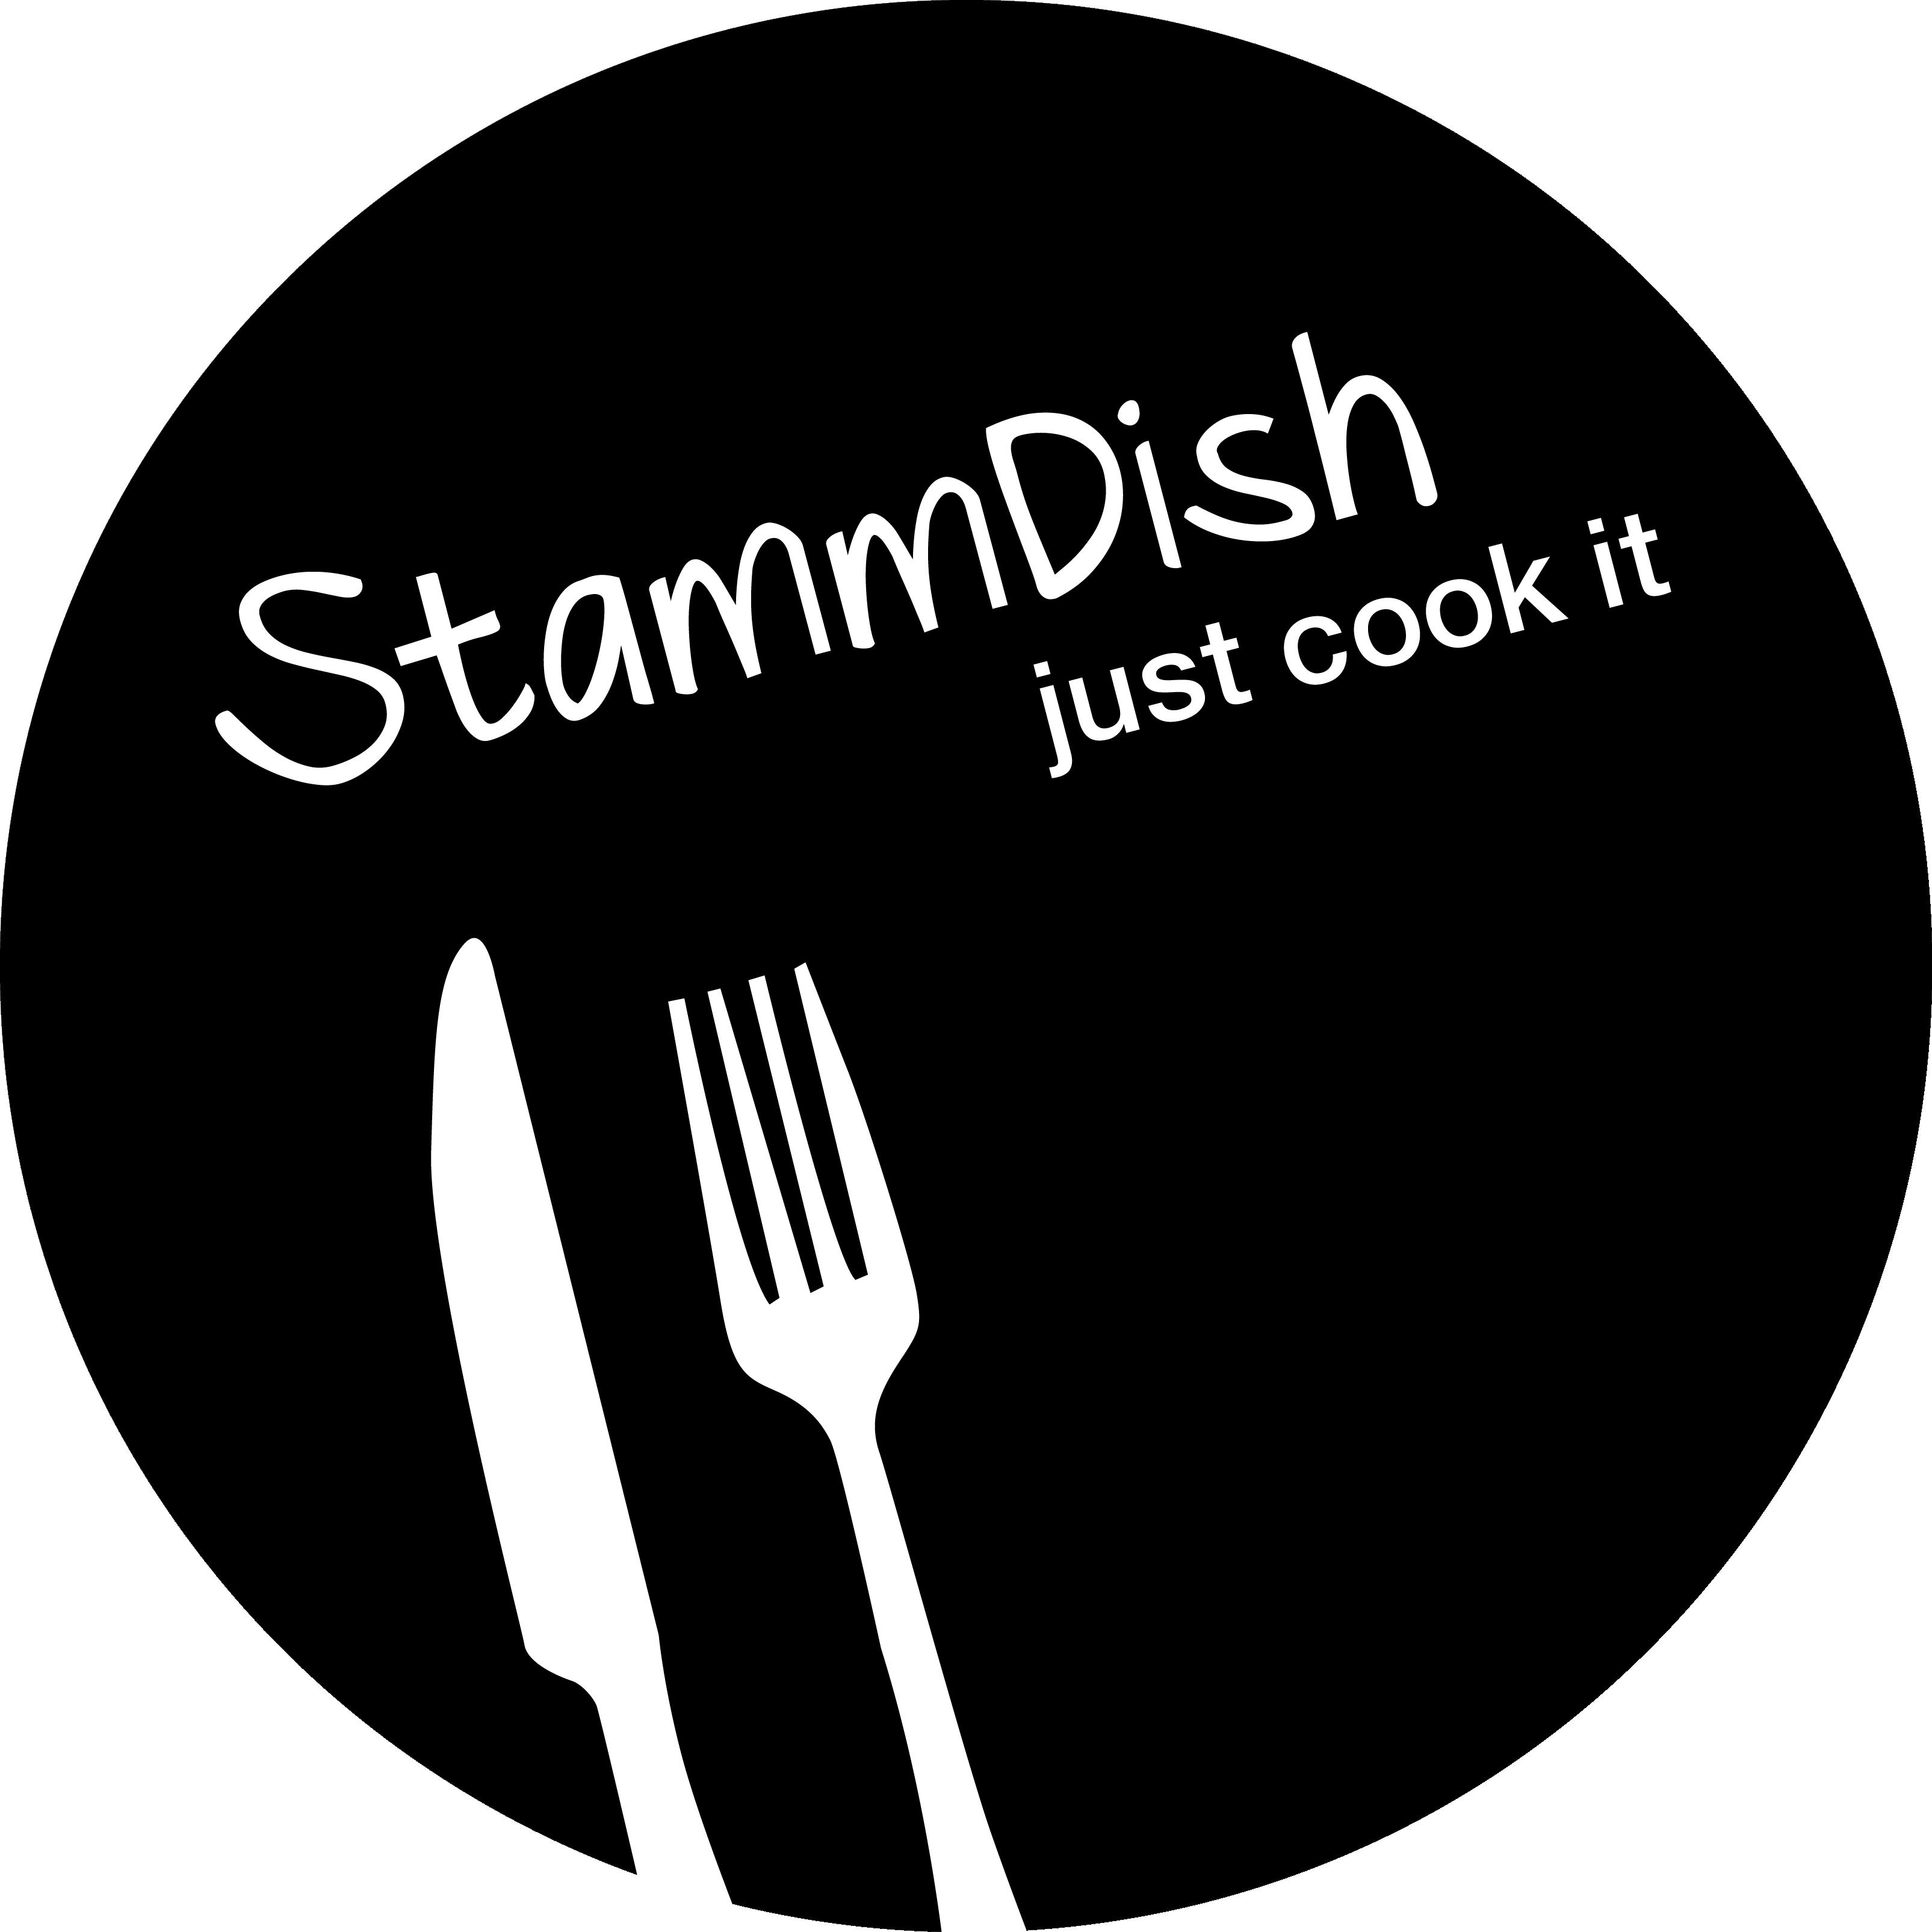 StammDish